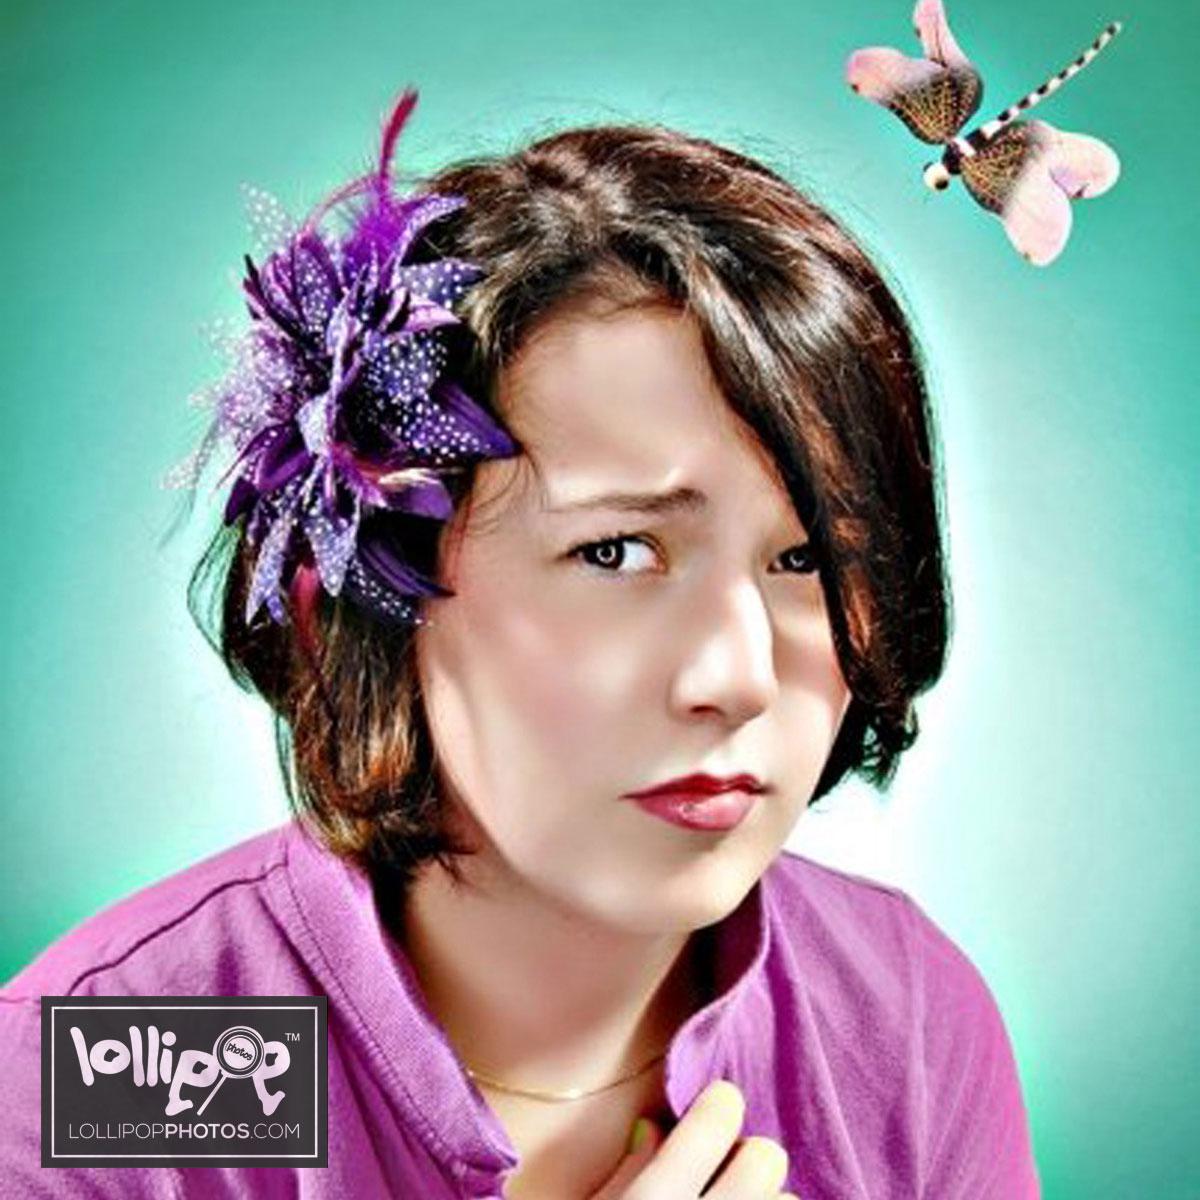 msdig-nora-canfield-lollipop-photos-179.jpg